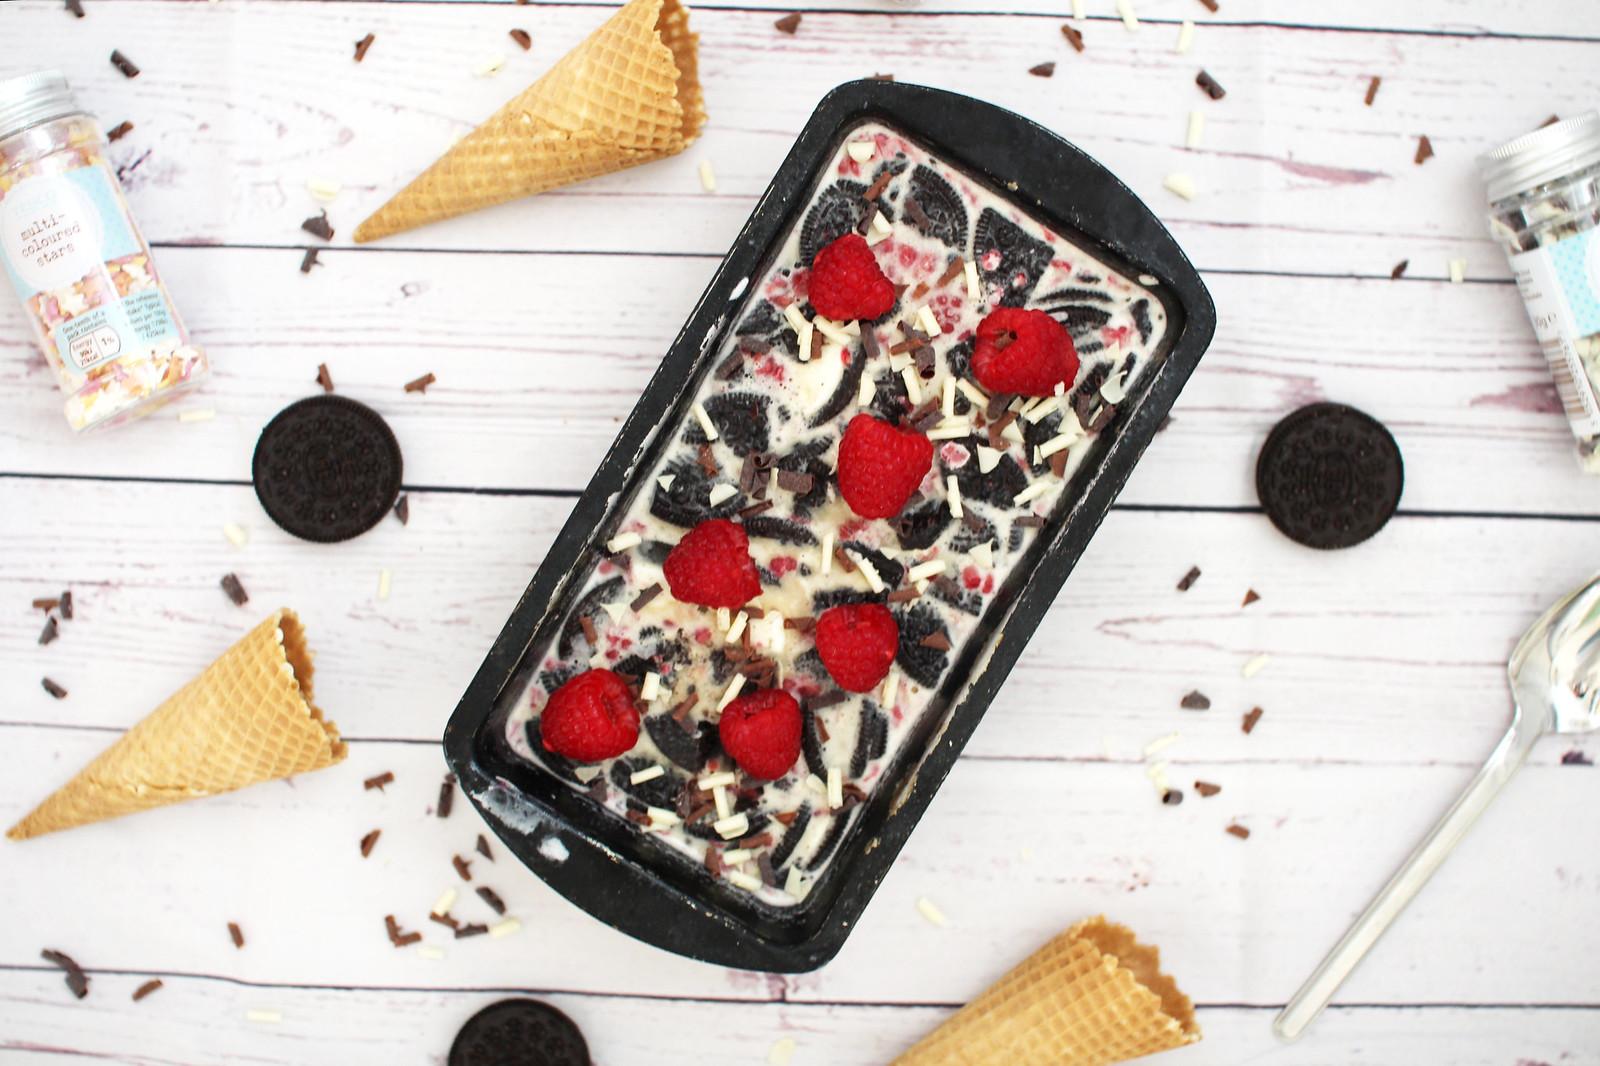 No-Churn Ice Cream Recipe The Little Things Lifestyle Blog UK Edinburgh